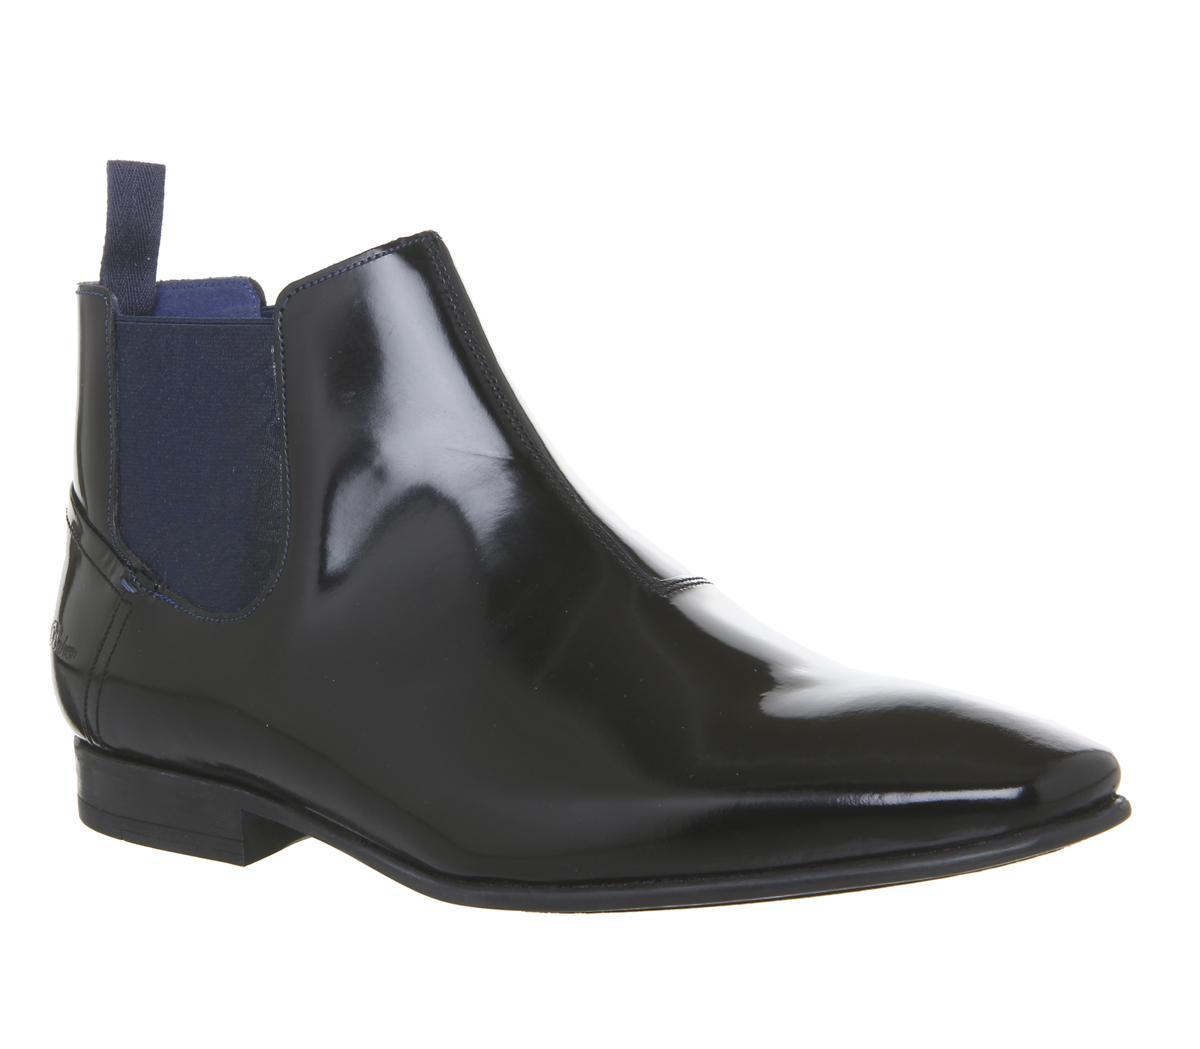 Lameth Chelsea Boots